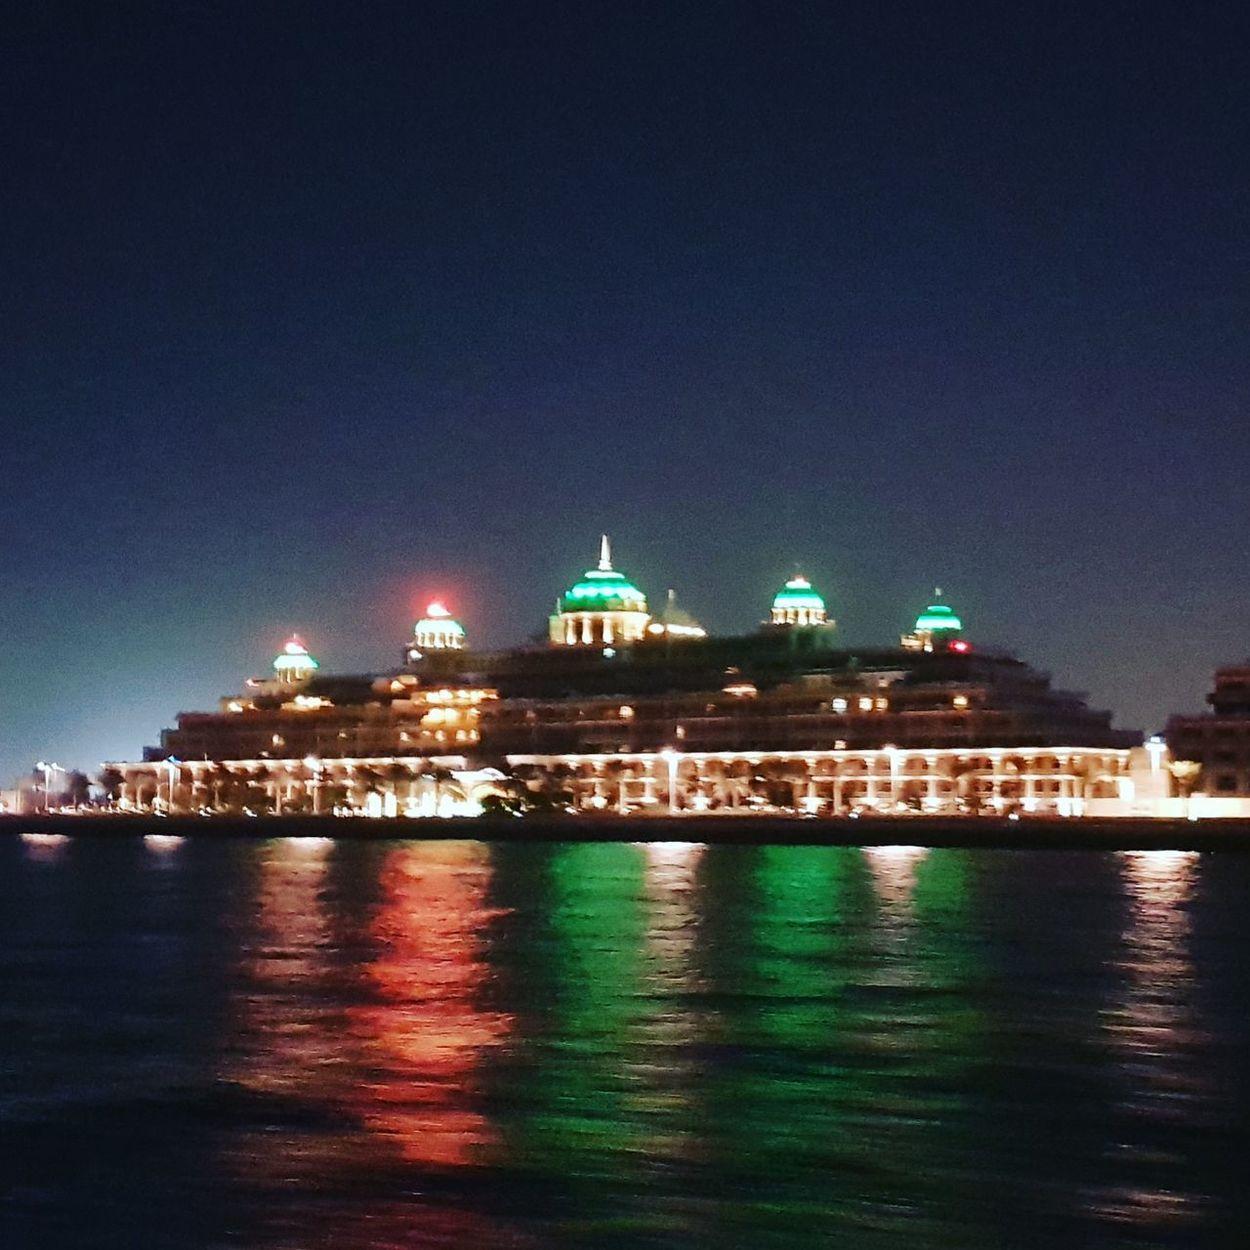 Night Illuminated Water Dome Building Exterior Sea Architecture City Sky